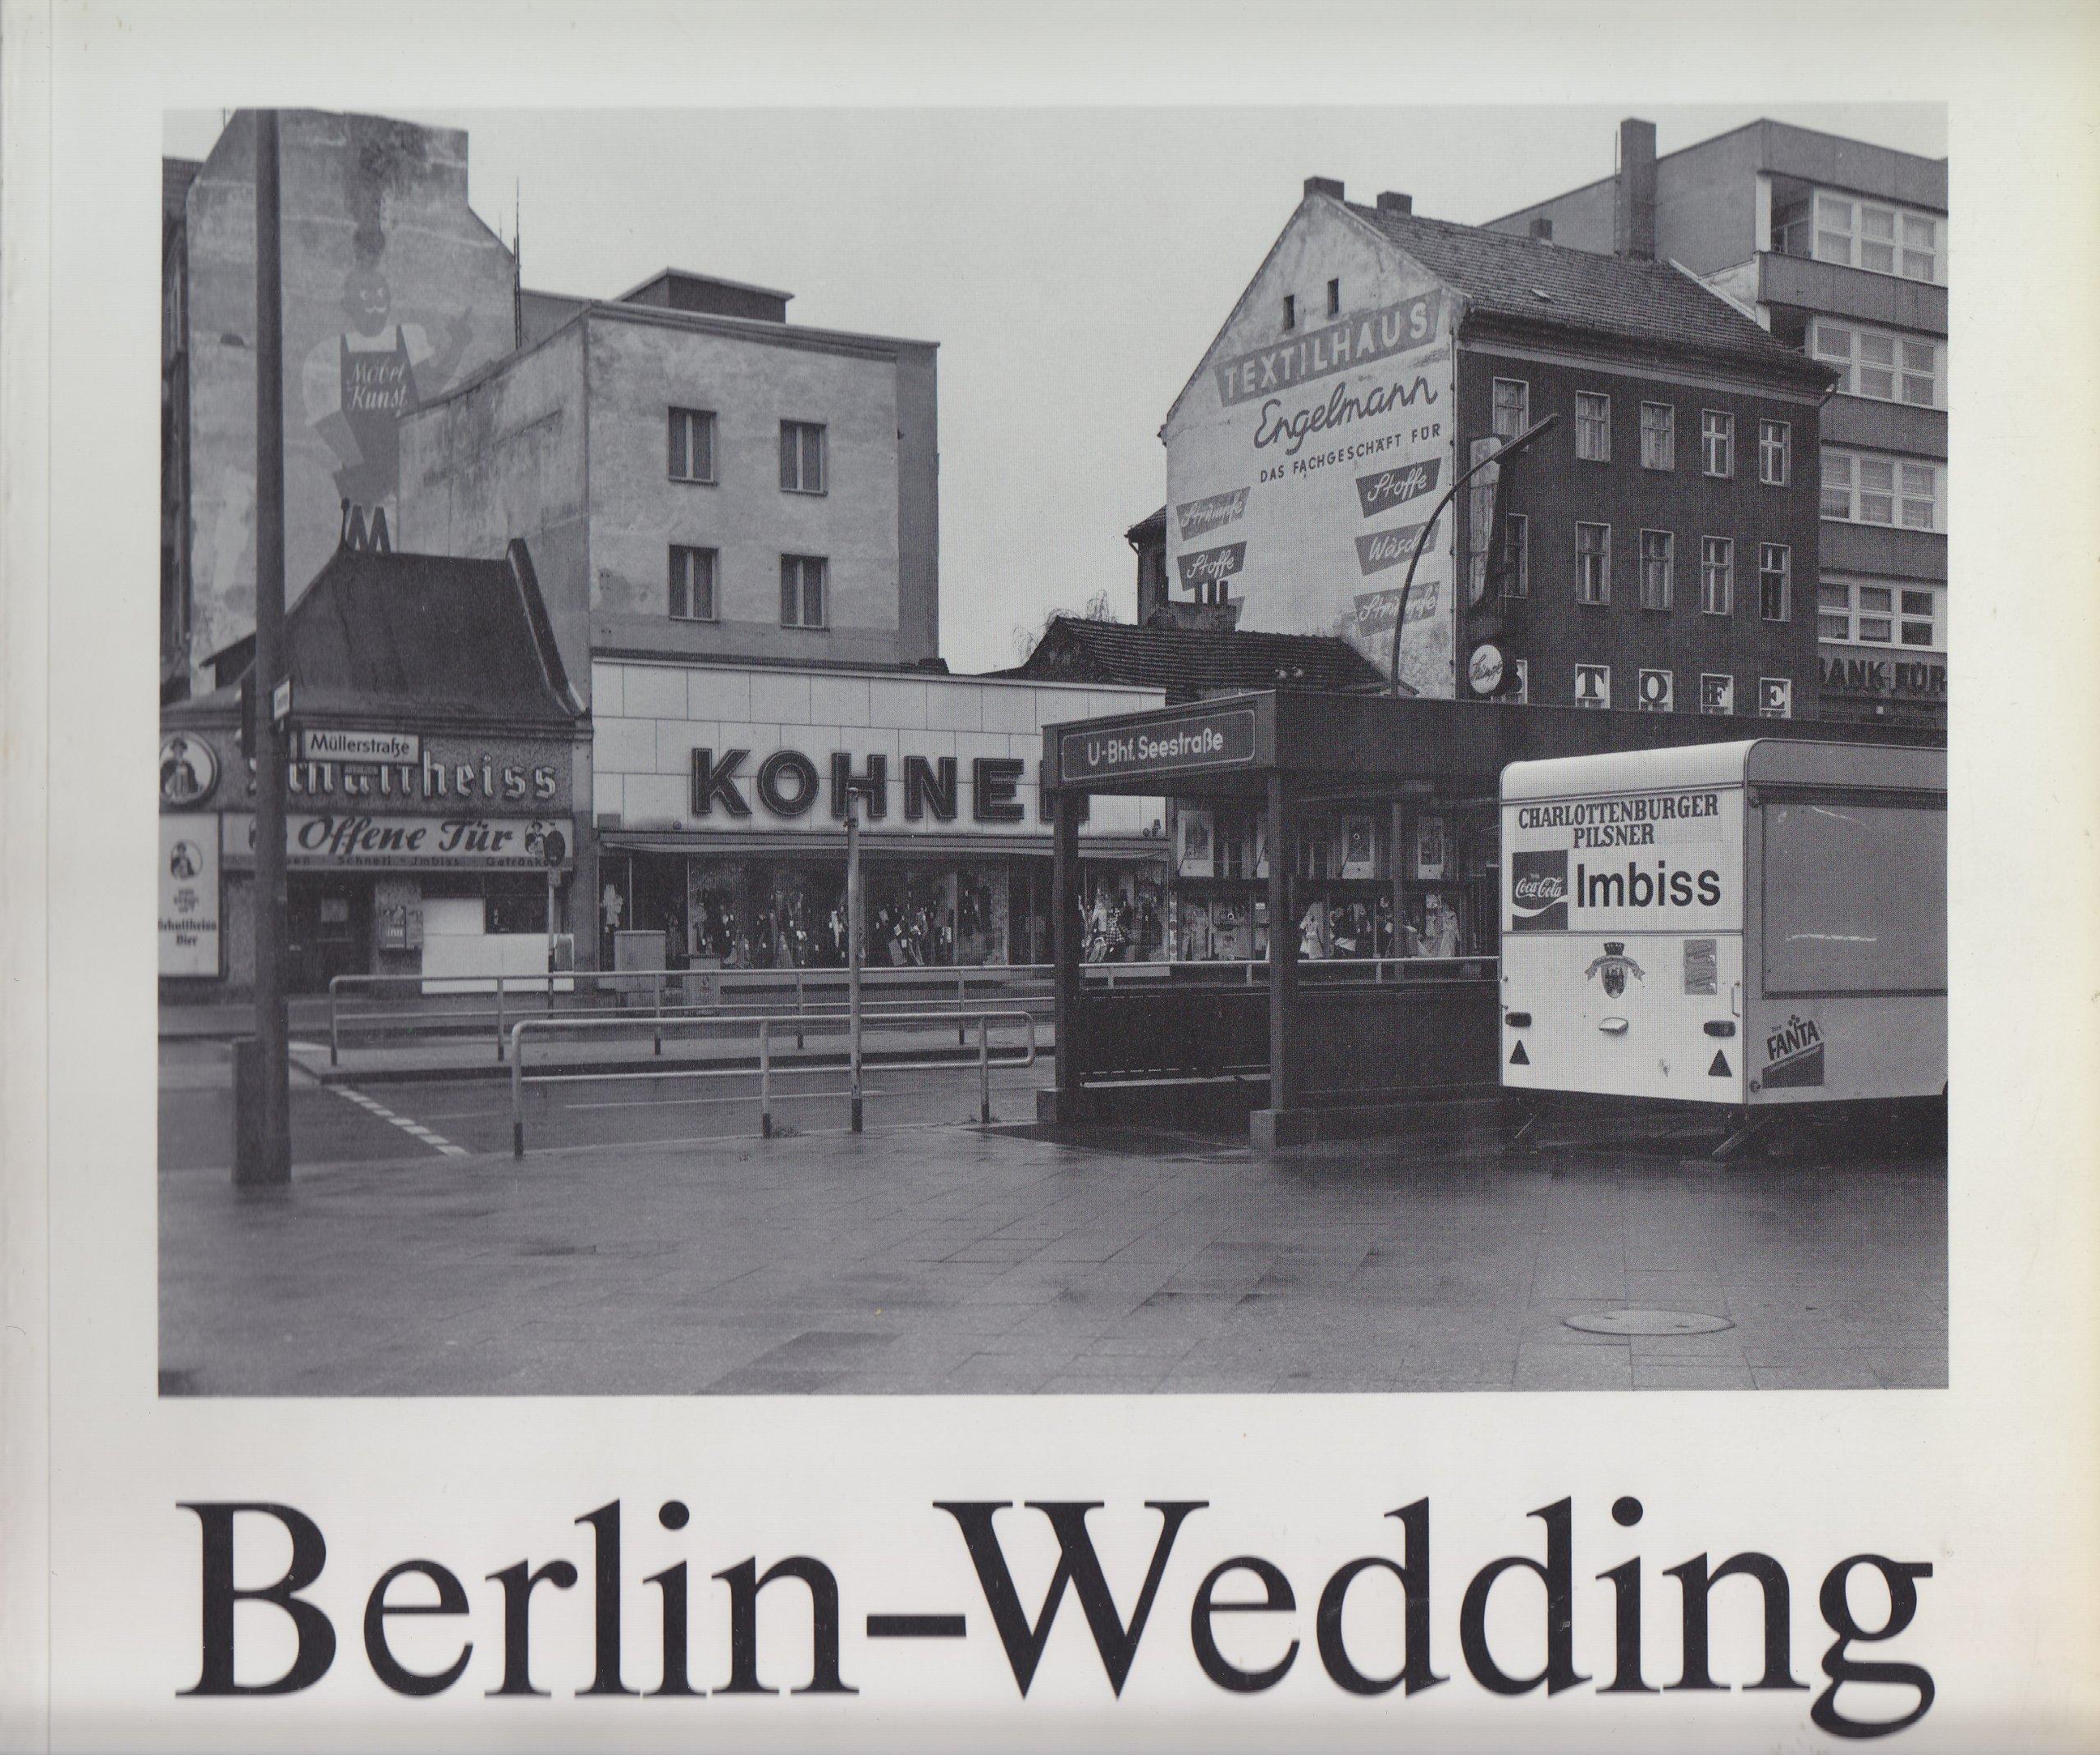 bauhaus wedding bauhaus berlin wedding kapweg 1 a bohemian brewery wedding at bauhaus brew. Black Bedroom Furniture Sets. Home Design Ideas